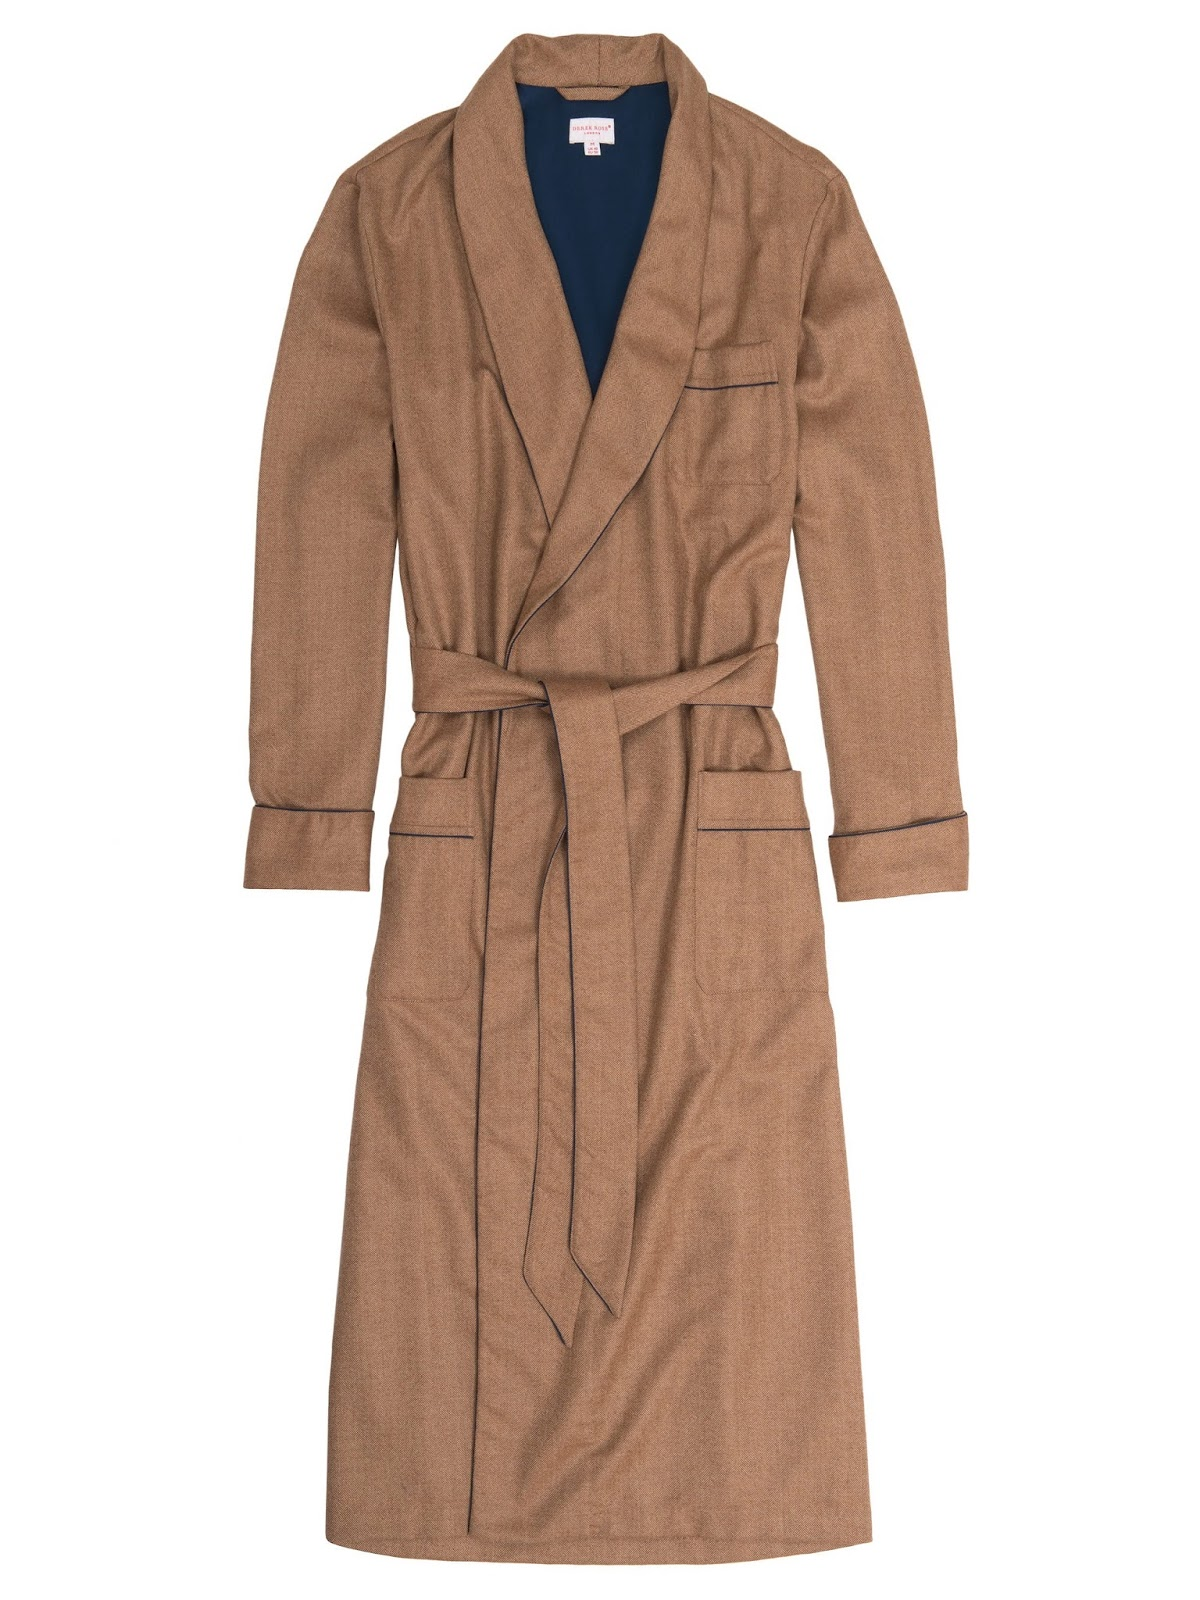 Sherlock Holmes's Dressing Gown - I Hear of Sherlock ...